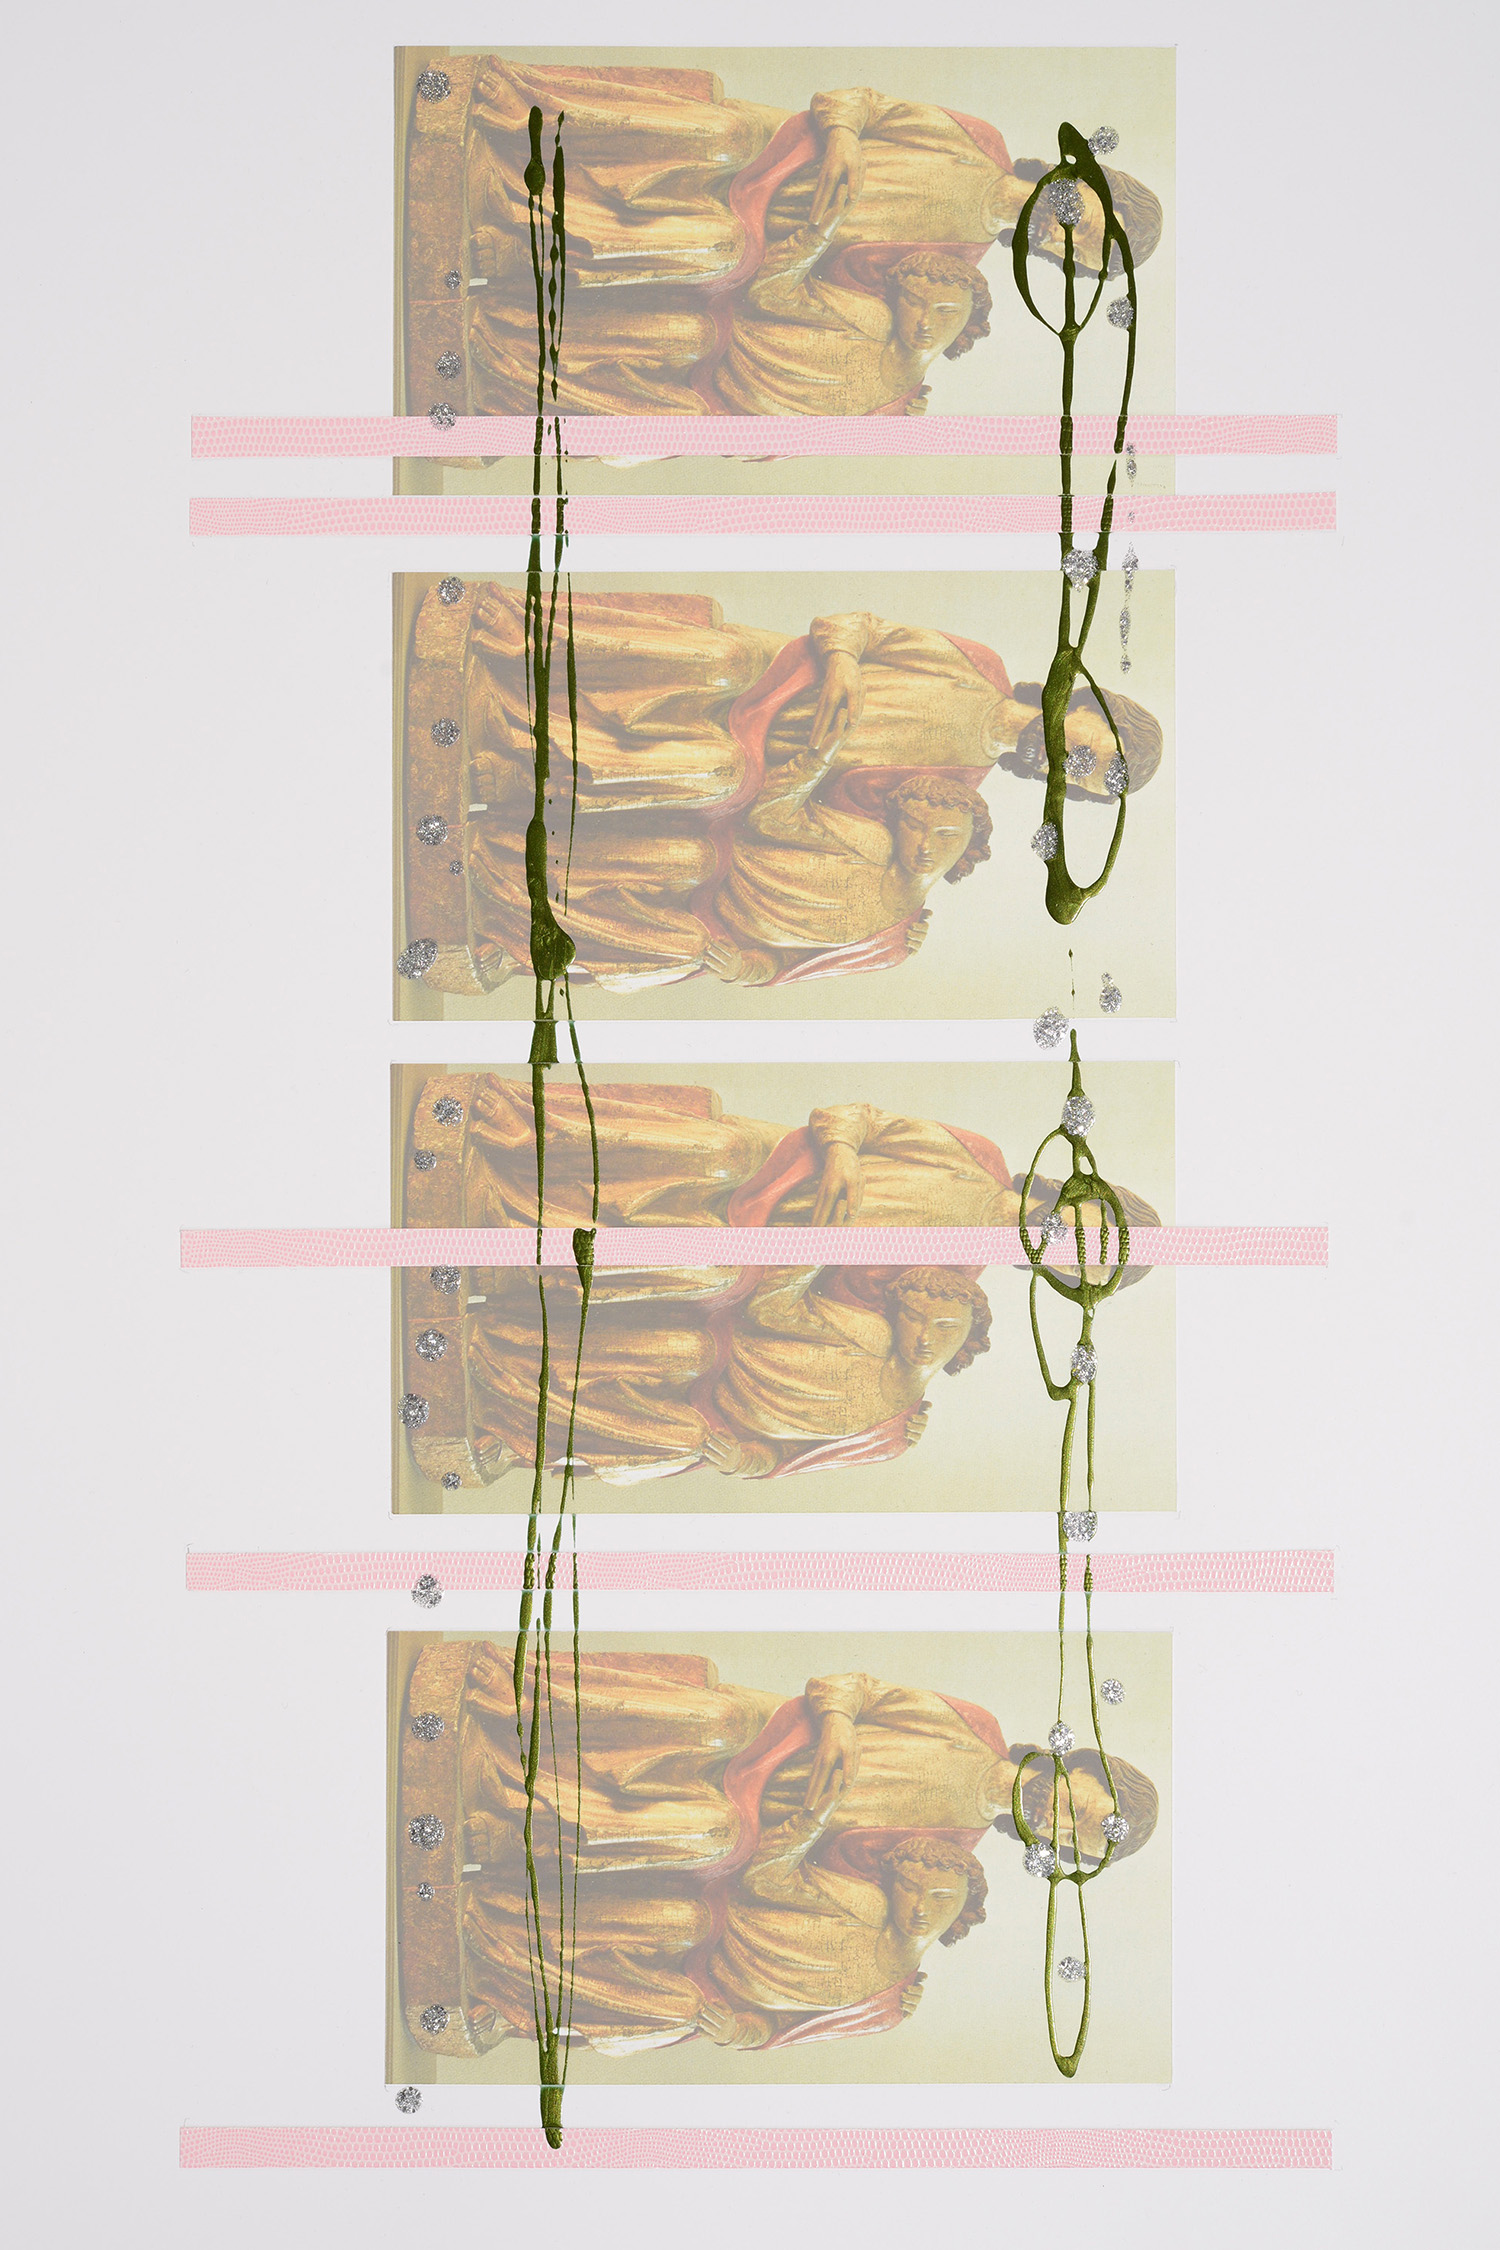 Markues  J Holding J, 2013  mixed media on paper  60 x 40 cm